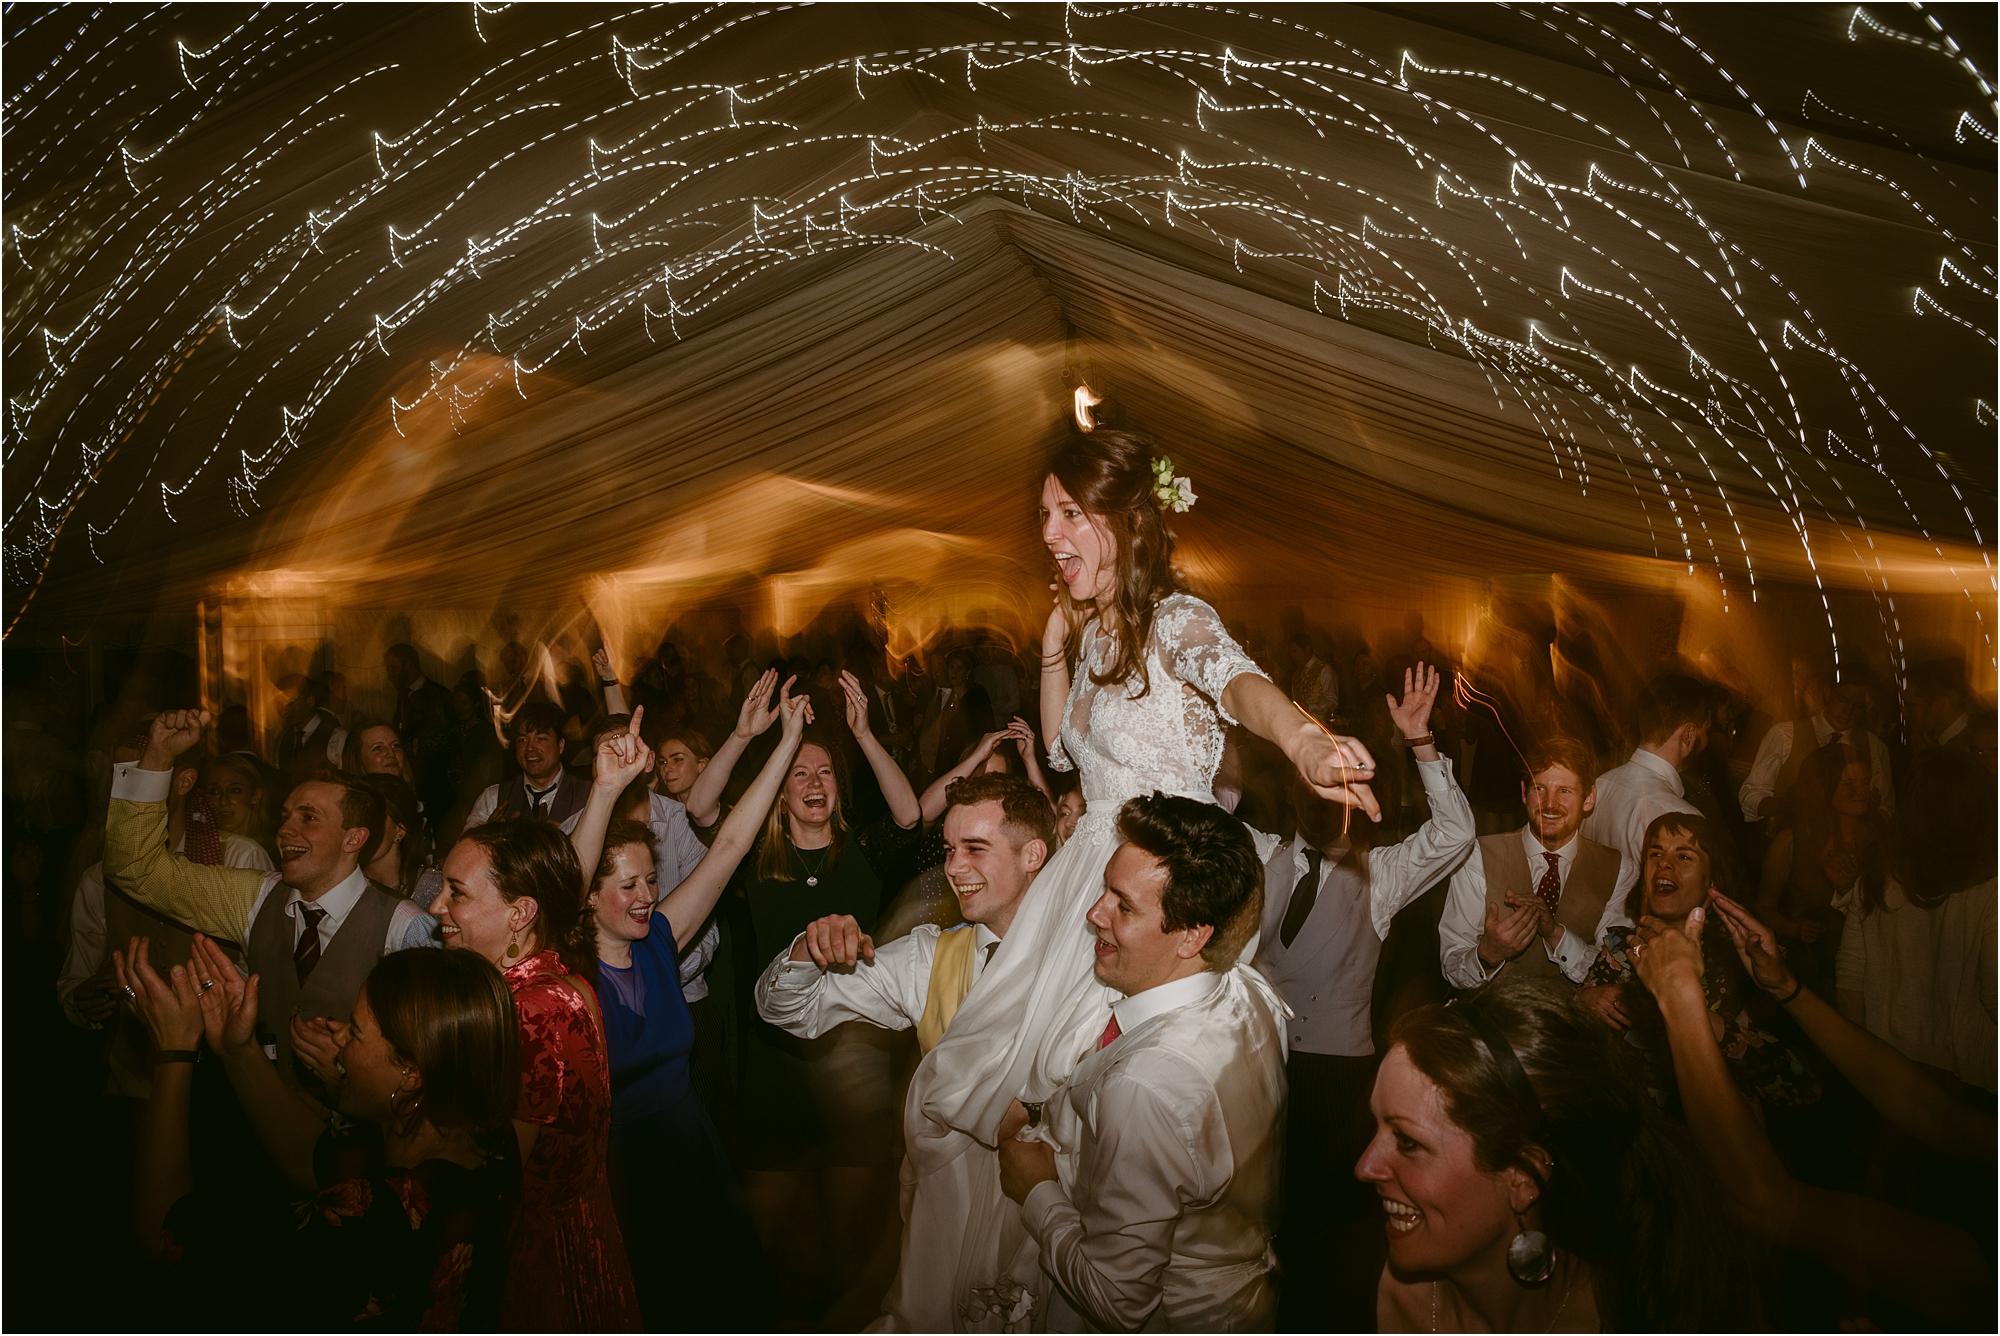 Rose+Harry-outdoor-english-wedding-photography__0126.jpg